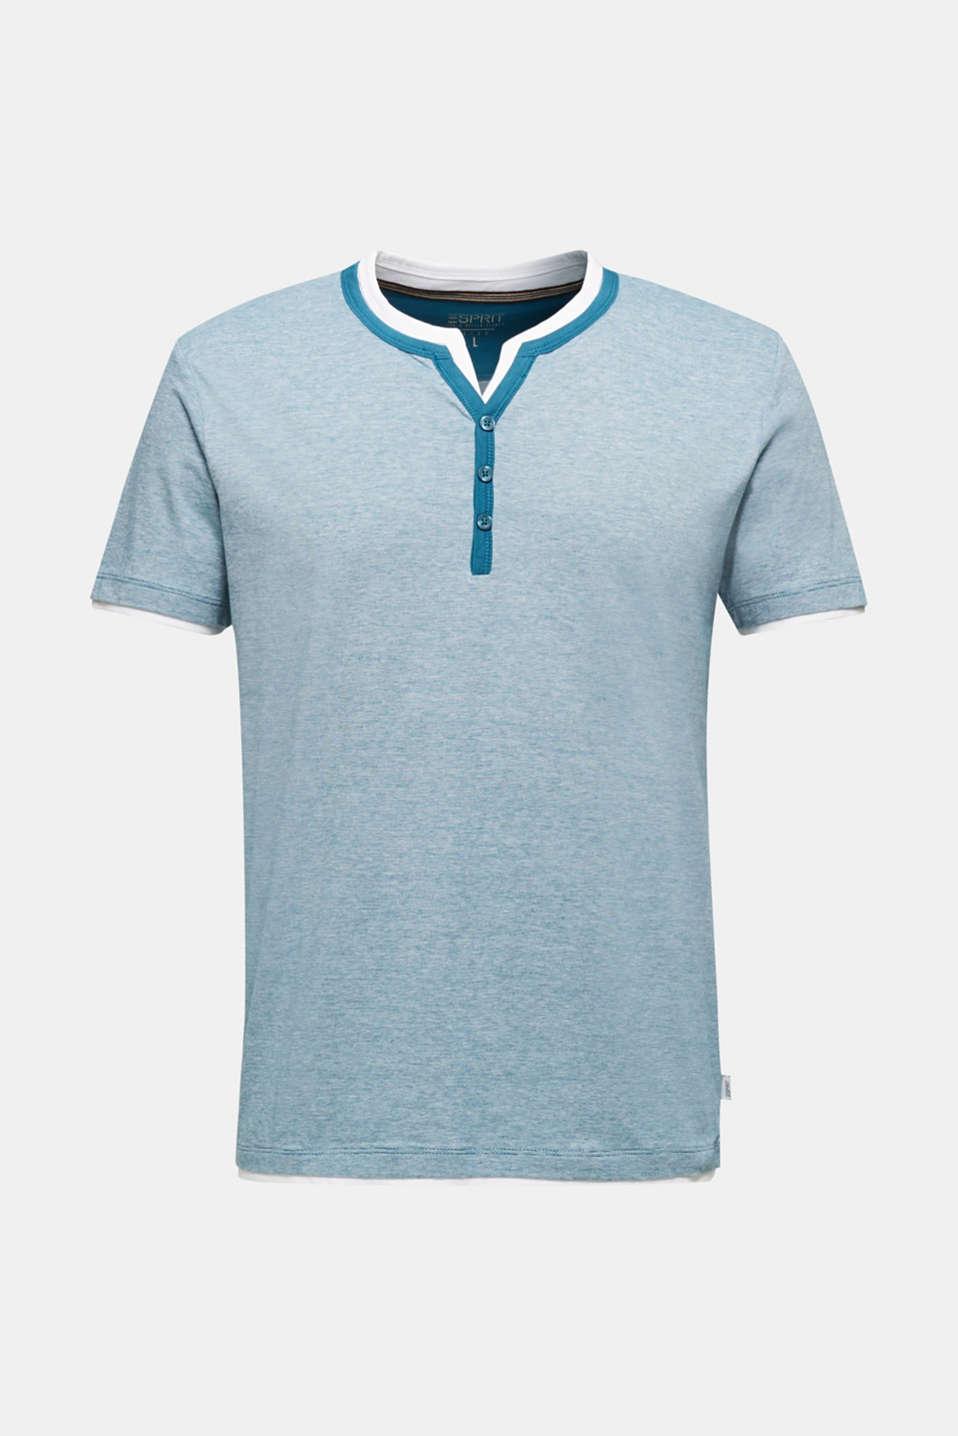 T-Shirts, PETROL BLUE 3, detail image number 5